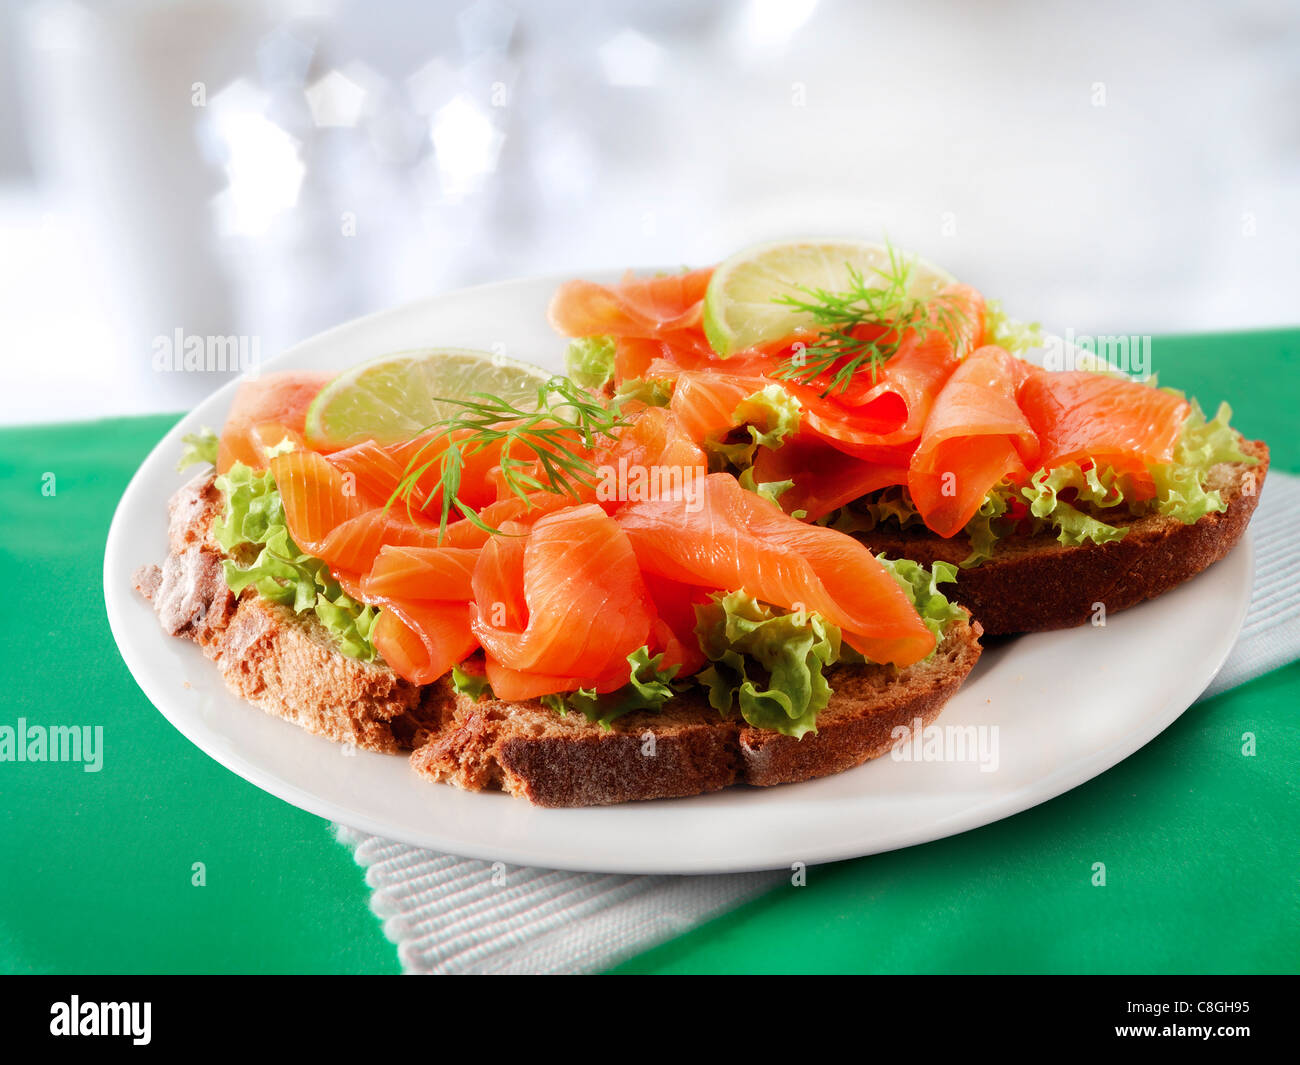 Smoked Salmon & salad Sandwich - Stock Image